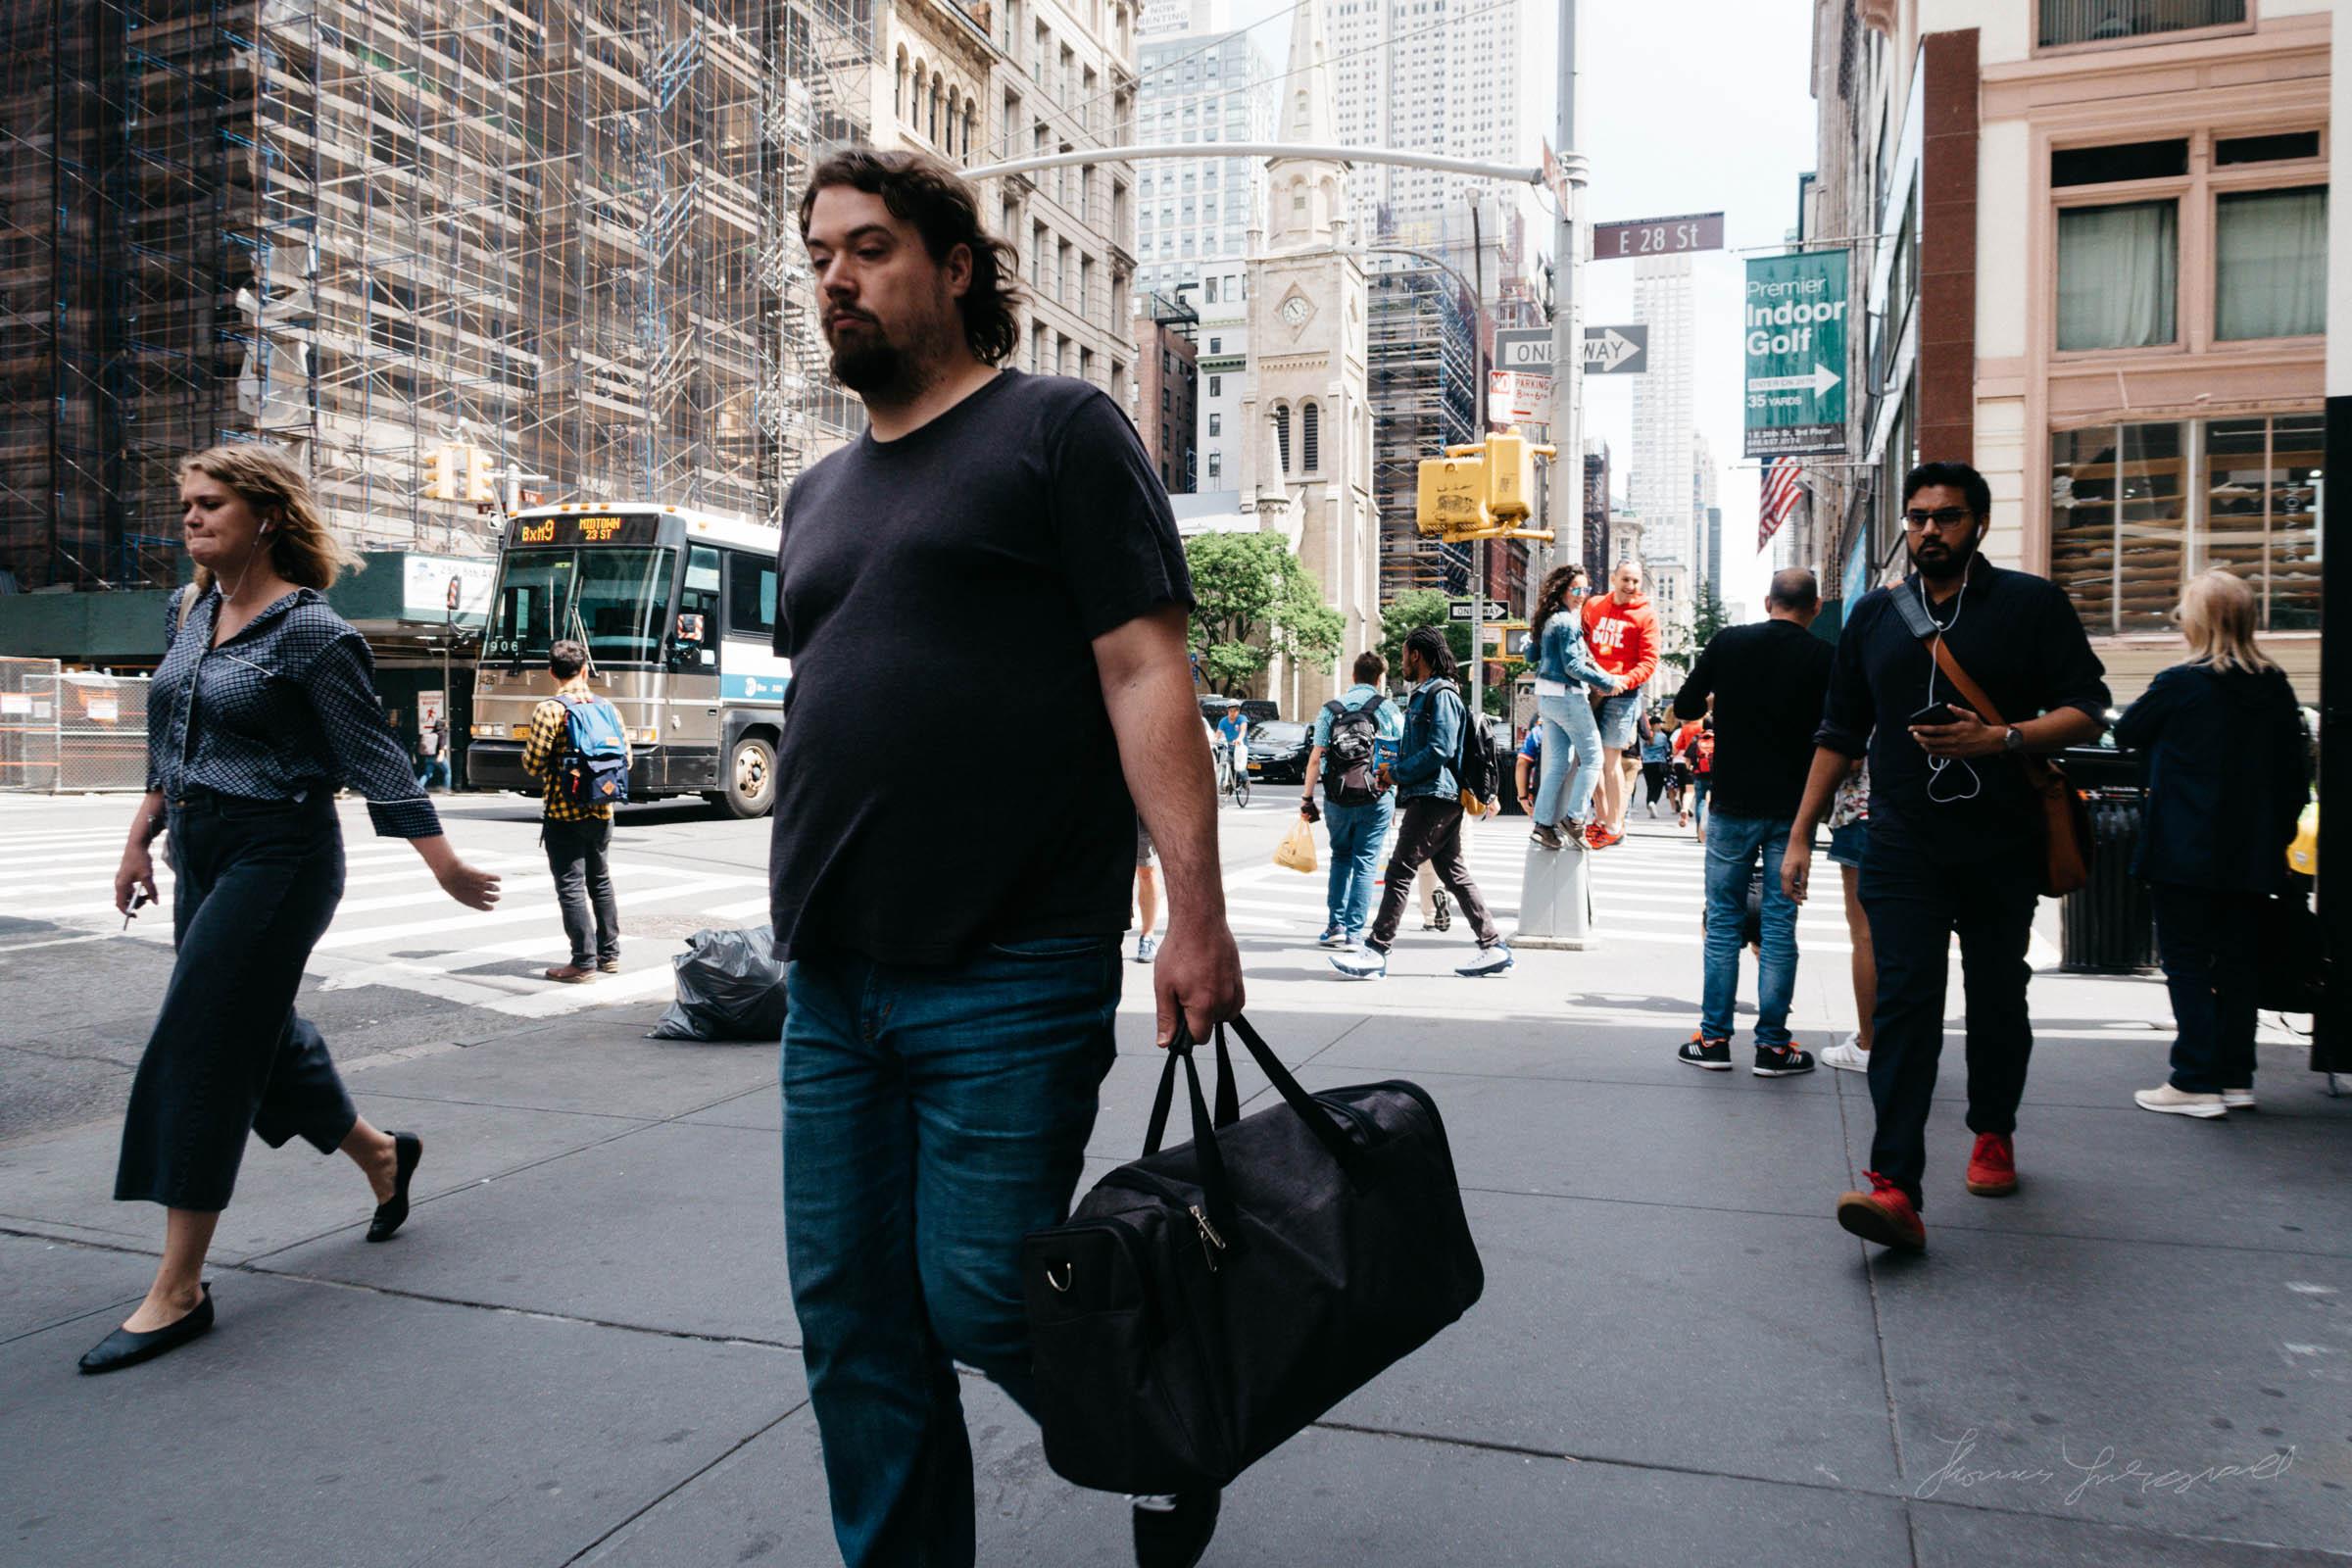 On 5th Avenue - Street Photo NYC